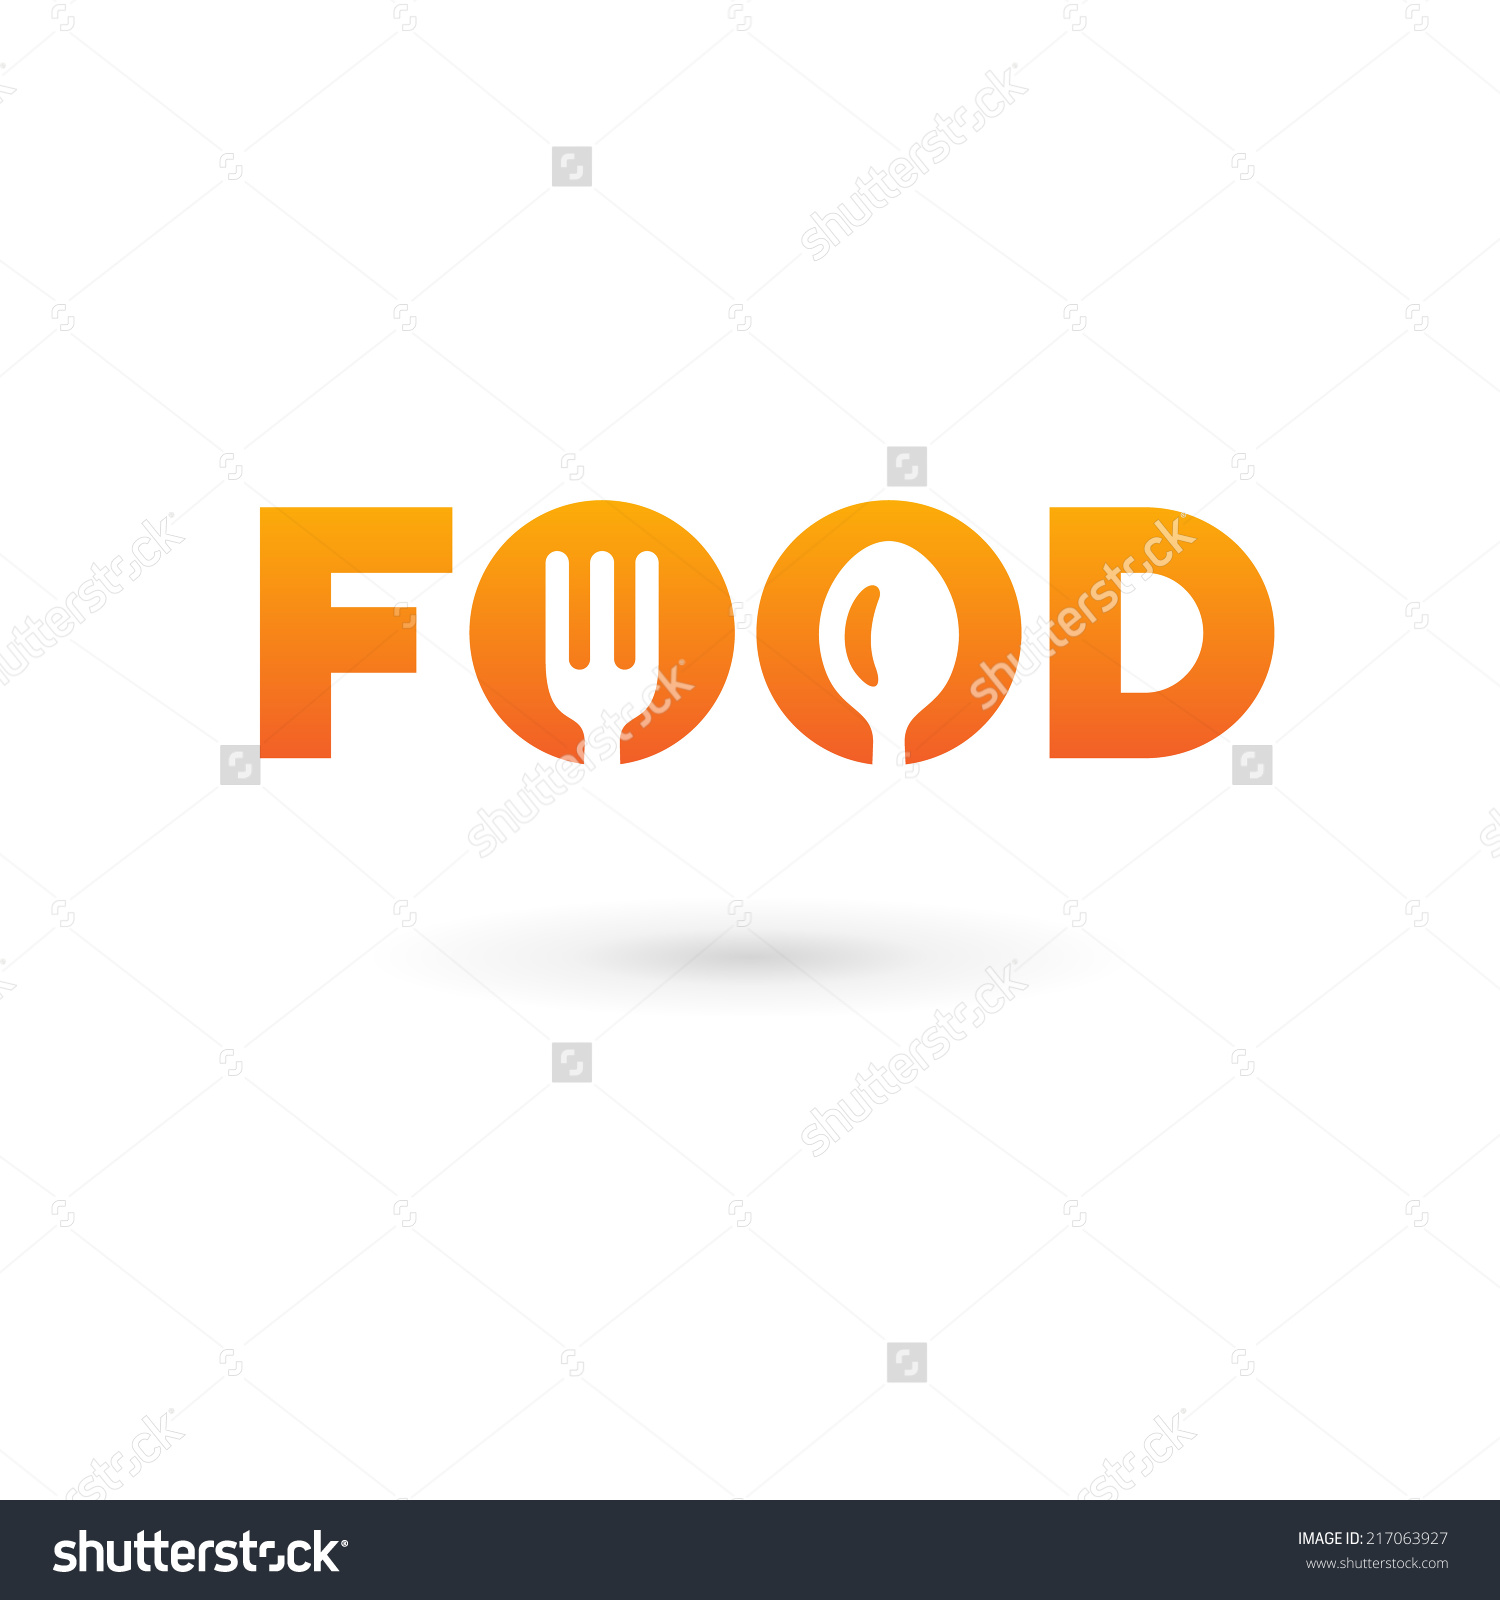 Word clipart food Words words food Clipart food